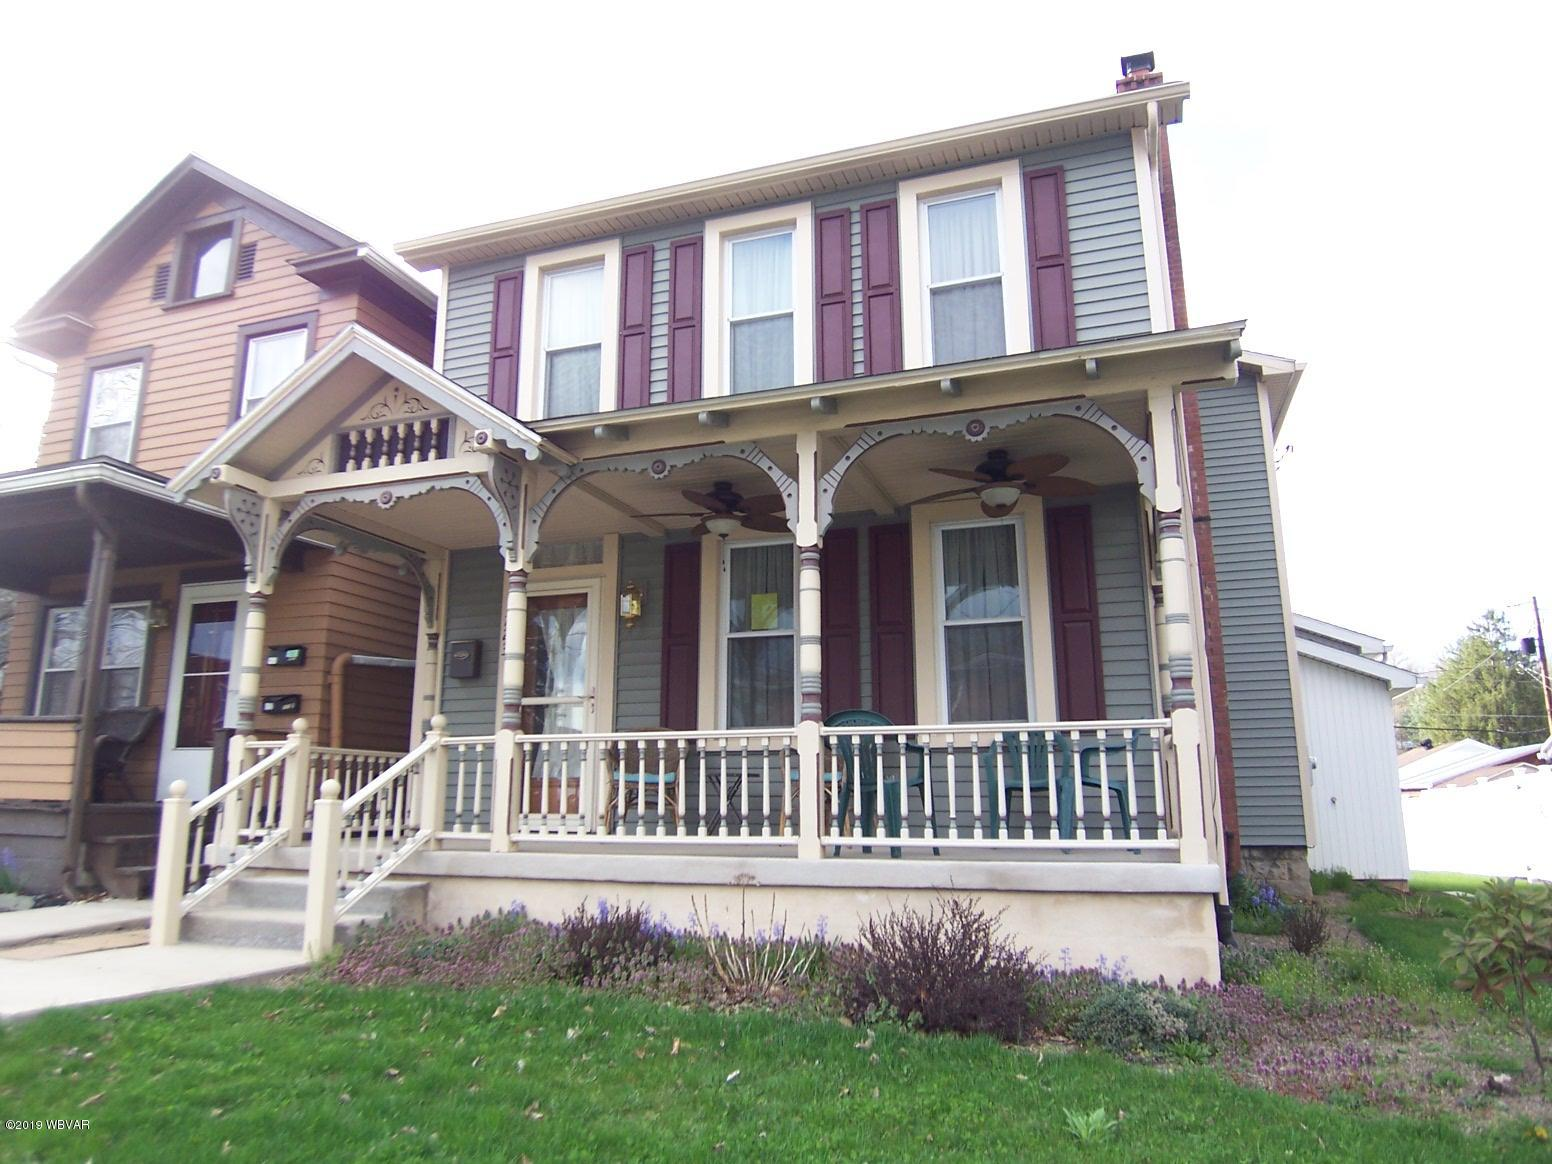 723 BELLEFONTE AVENUE,Lock Haven,PA 17745,3 Bedrooms Bedrooms,2 BathroomsBathrooms,Residential,BELLEFONTE,WB-86943